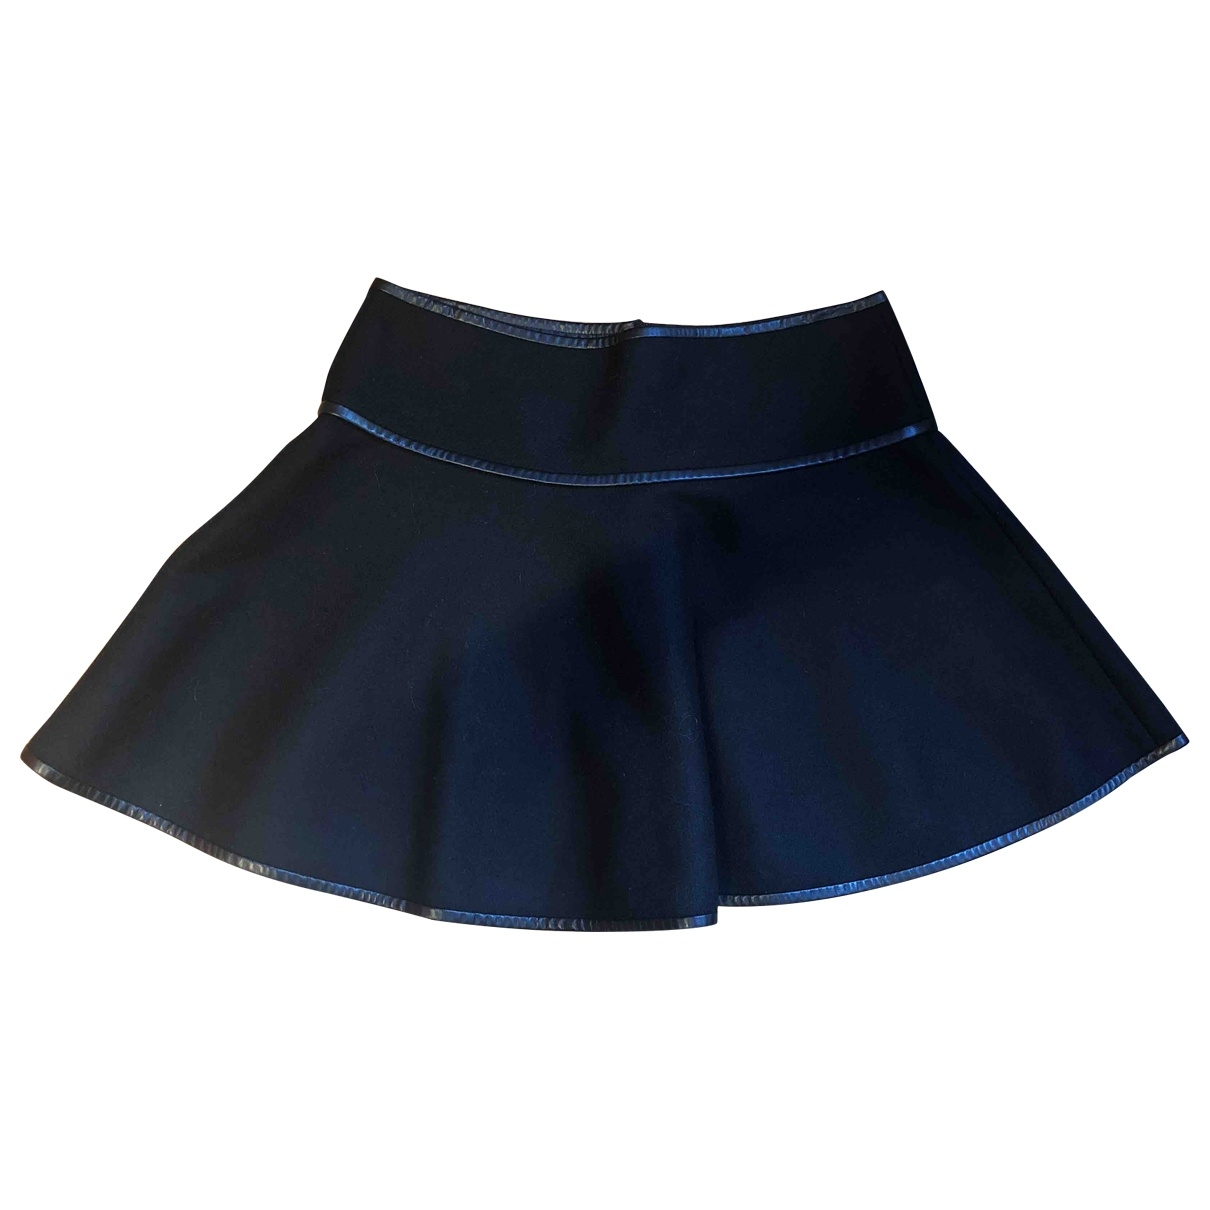 Red Valentino Garavani \N Black Wool skirt for Women 40 IT